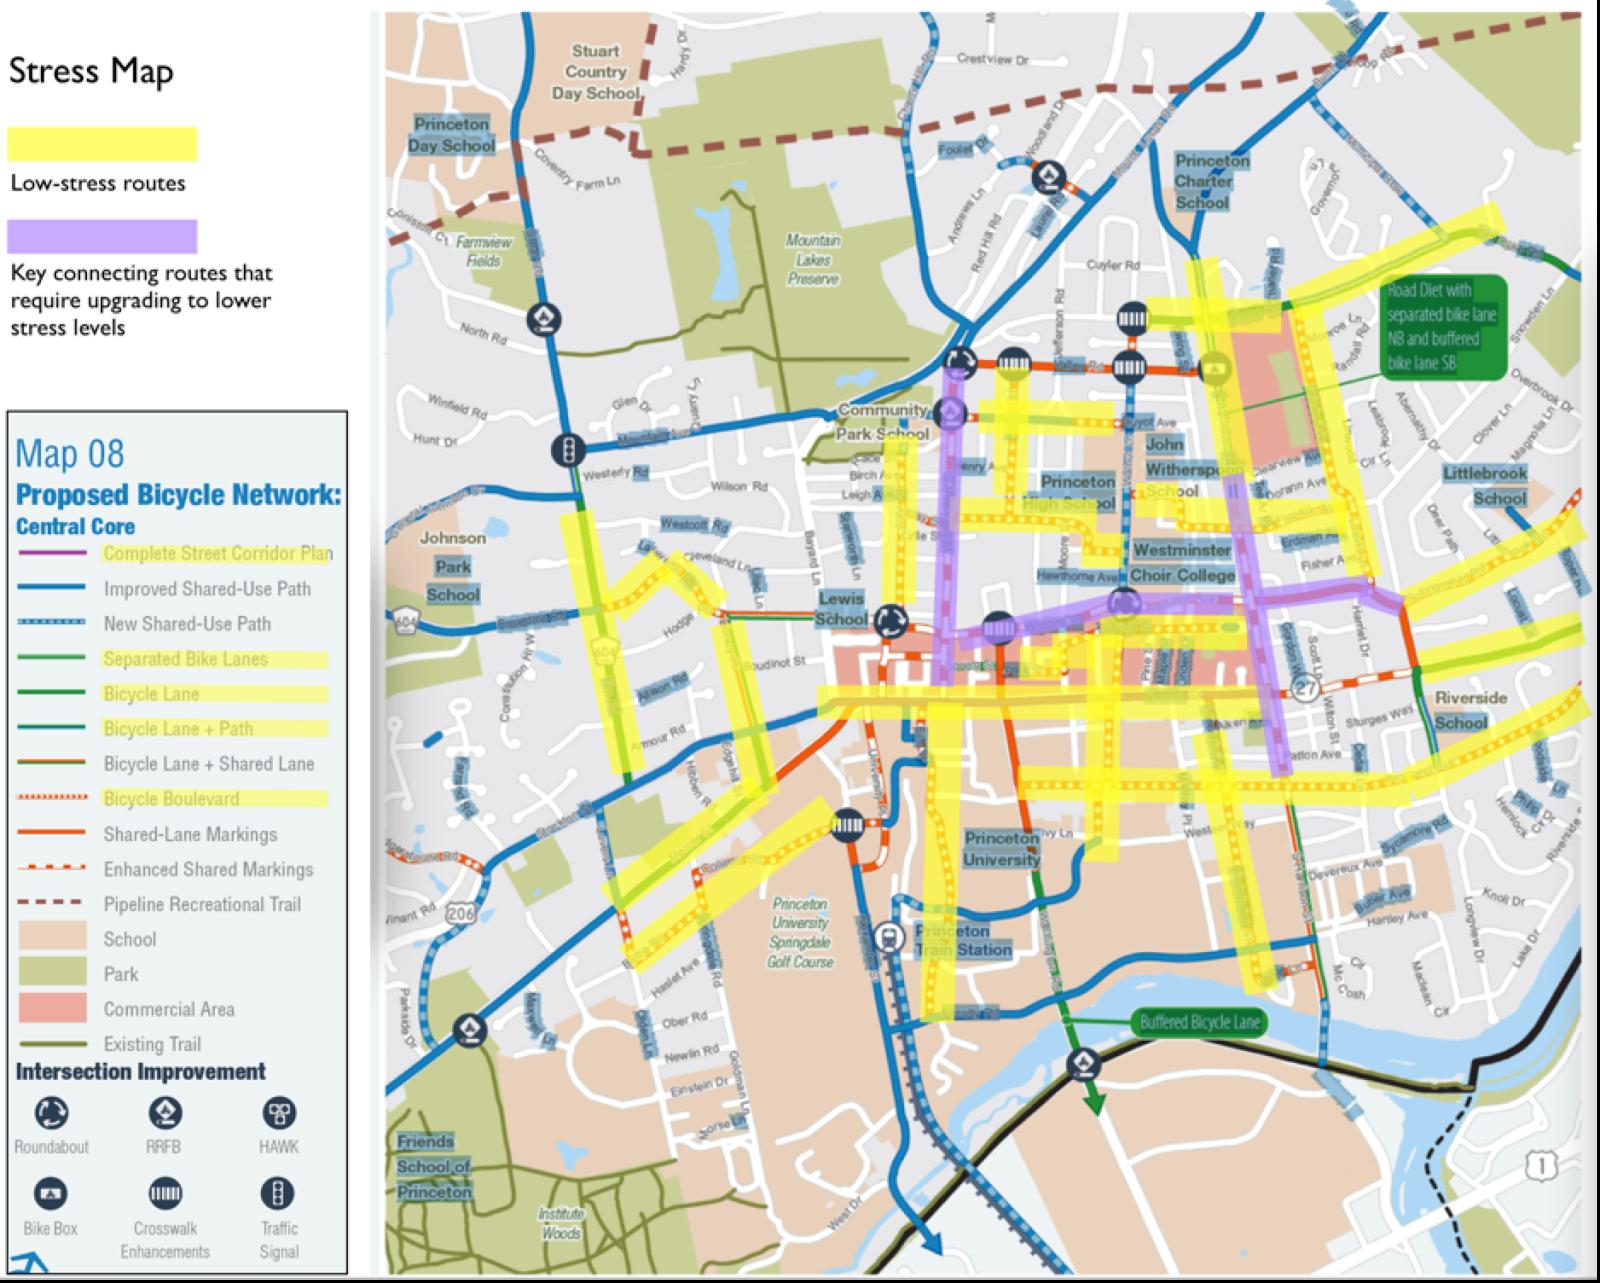 Downtown Princeton Map on